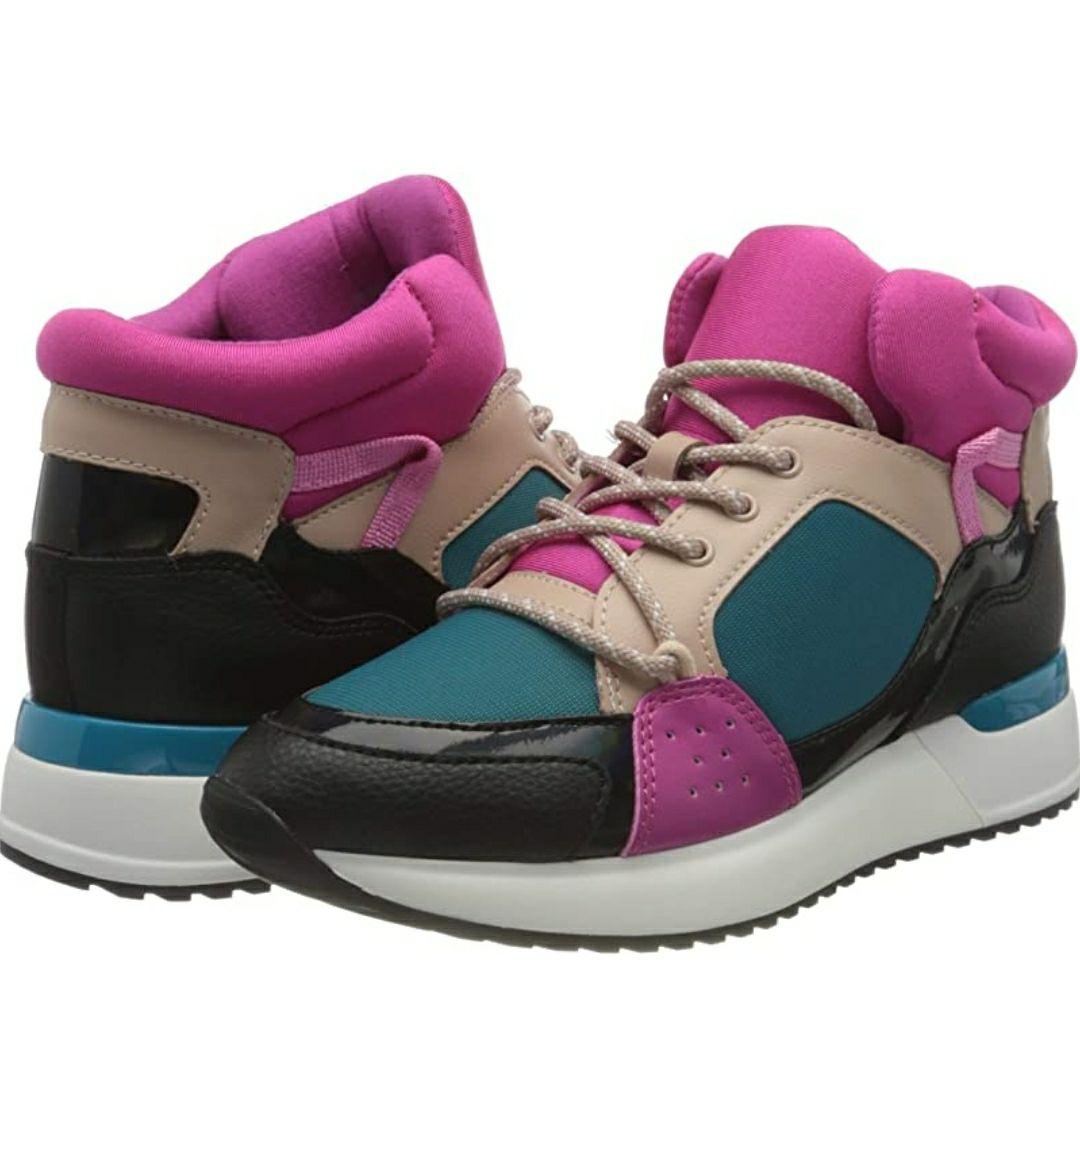 TALLA 41 - Aldo Aselawia, Zapatos CAS Mujer